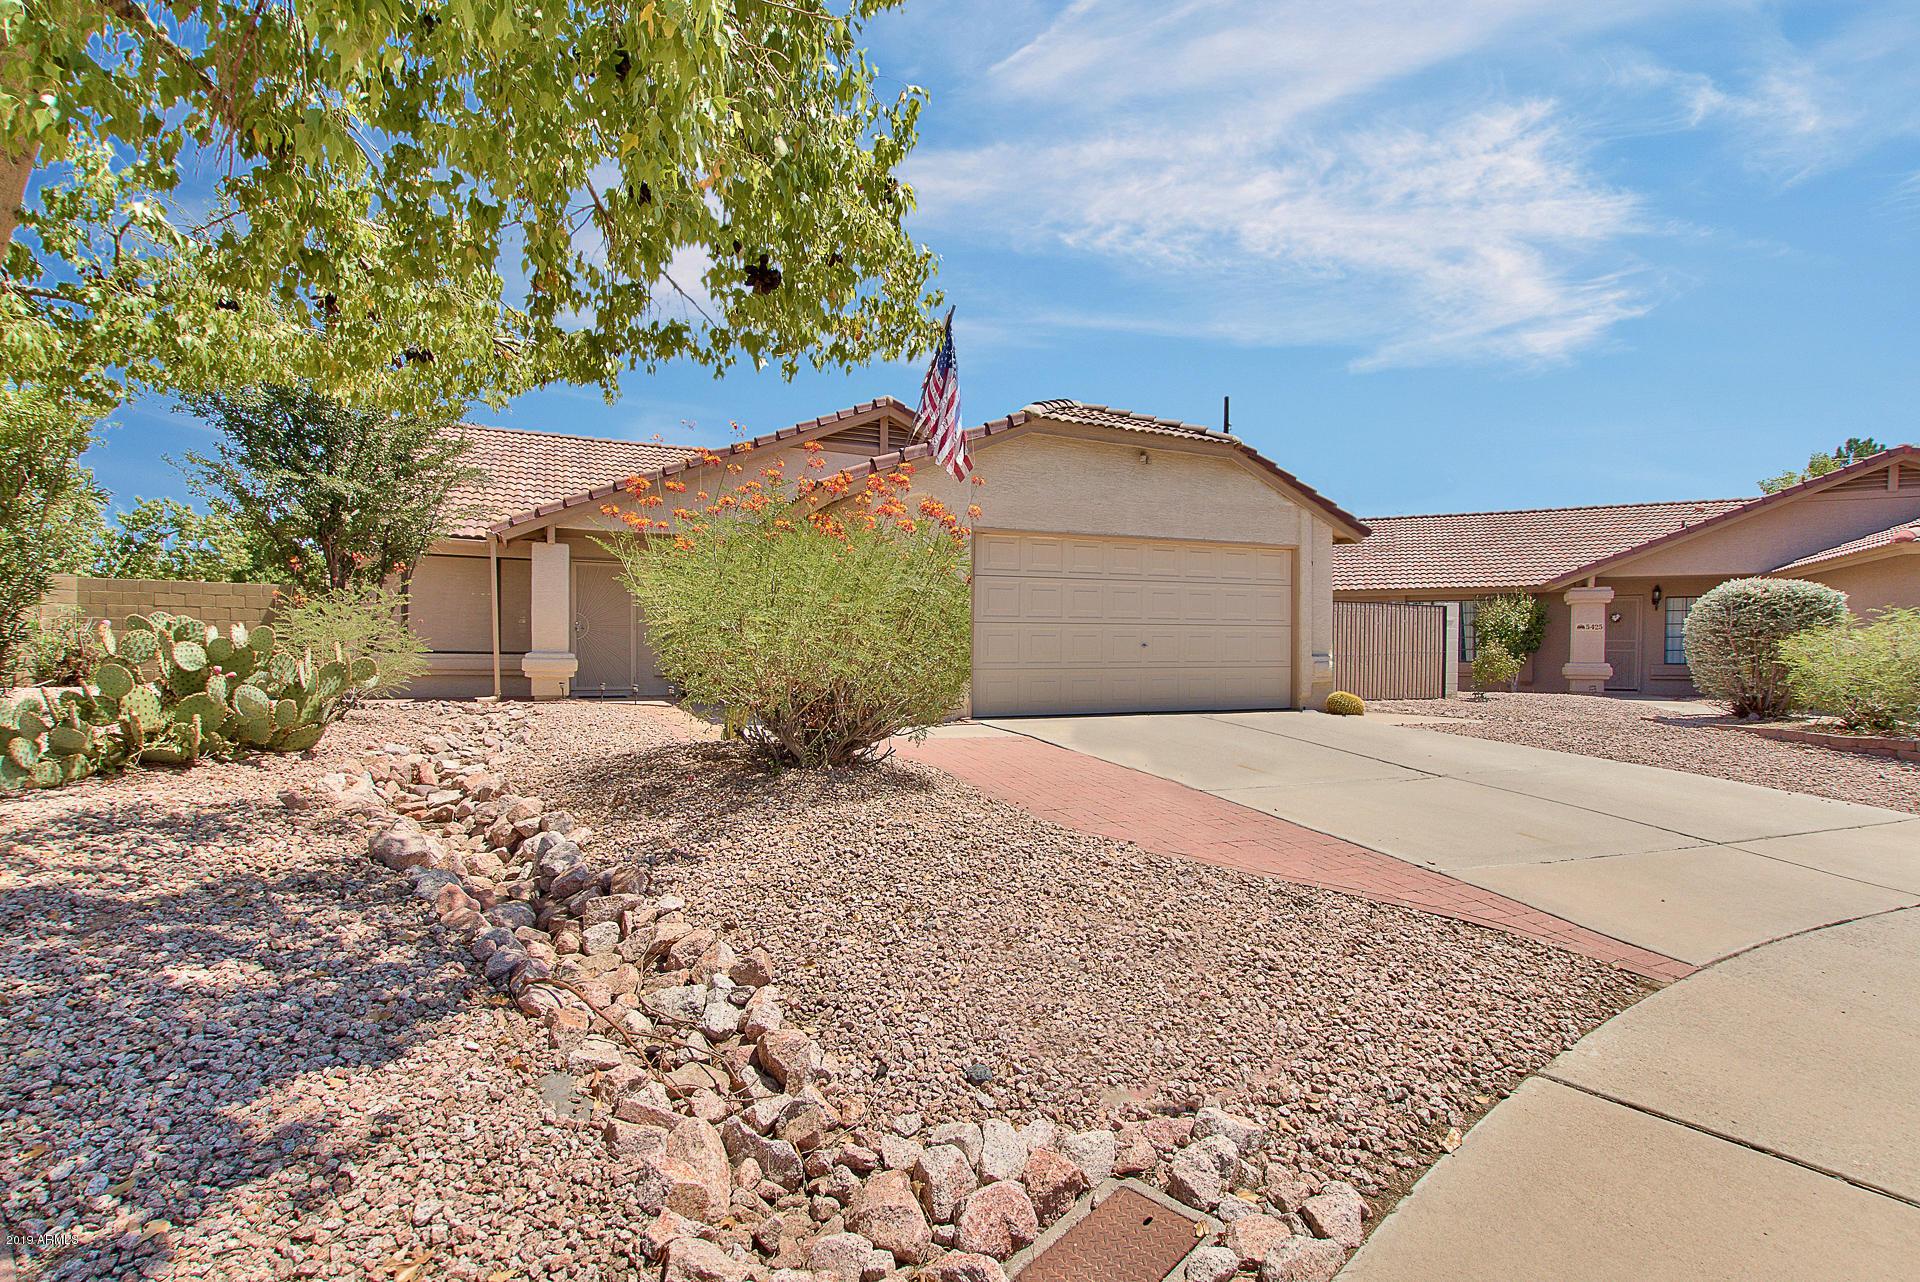 Photo of 5431 E GREENWAY Street, Mesa, AZ 85205